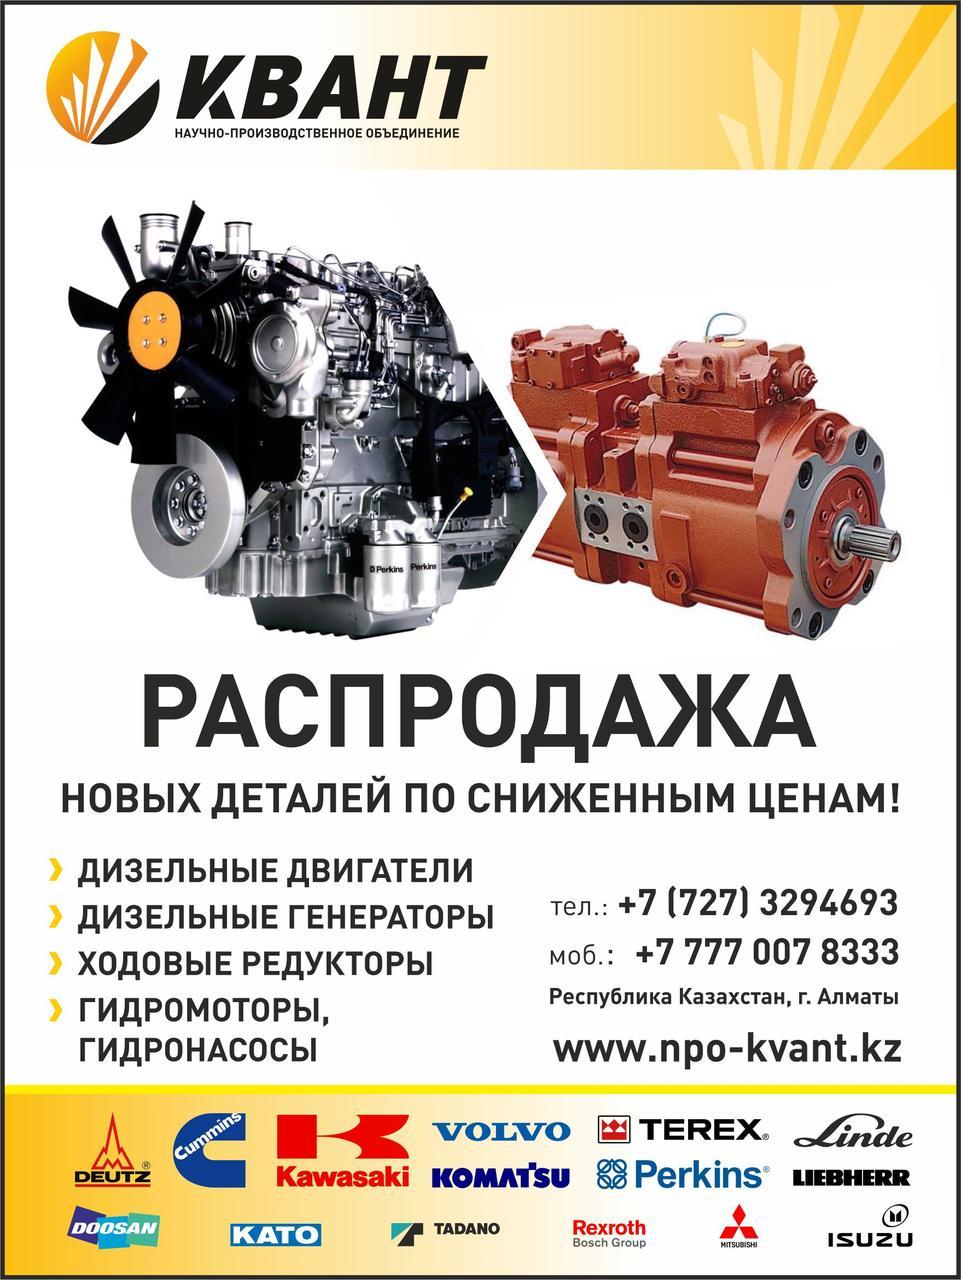 Двигатель Iveco F4GE0687A*B600, F4GE0687A*B601, F4GE9454C, F4GE9454H, F4GE9454H*J603, F4GE9454J, F4GE9454J